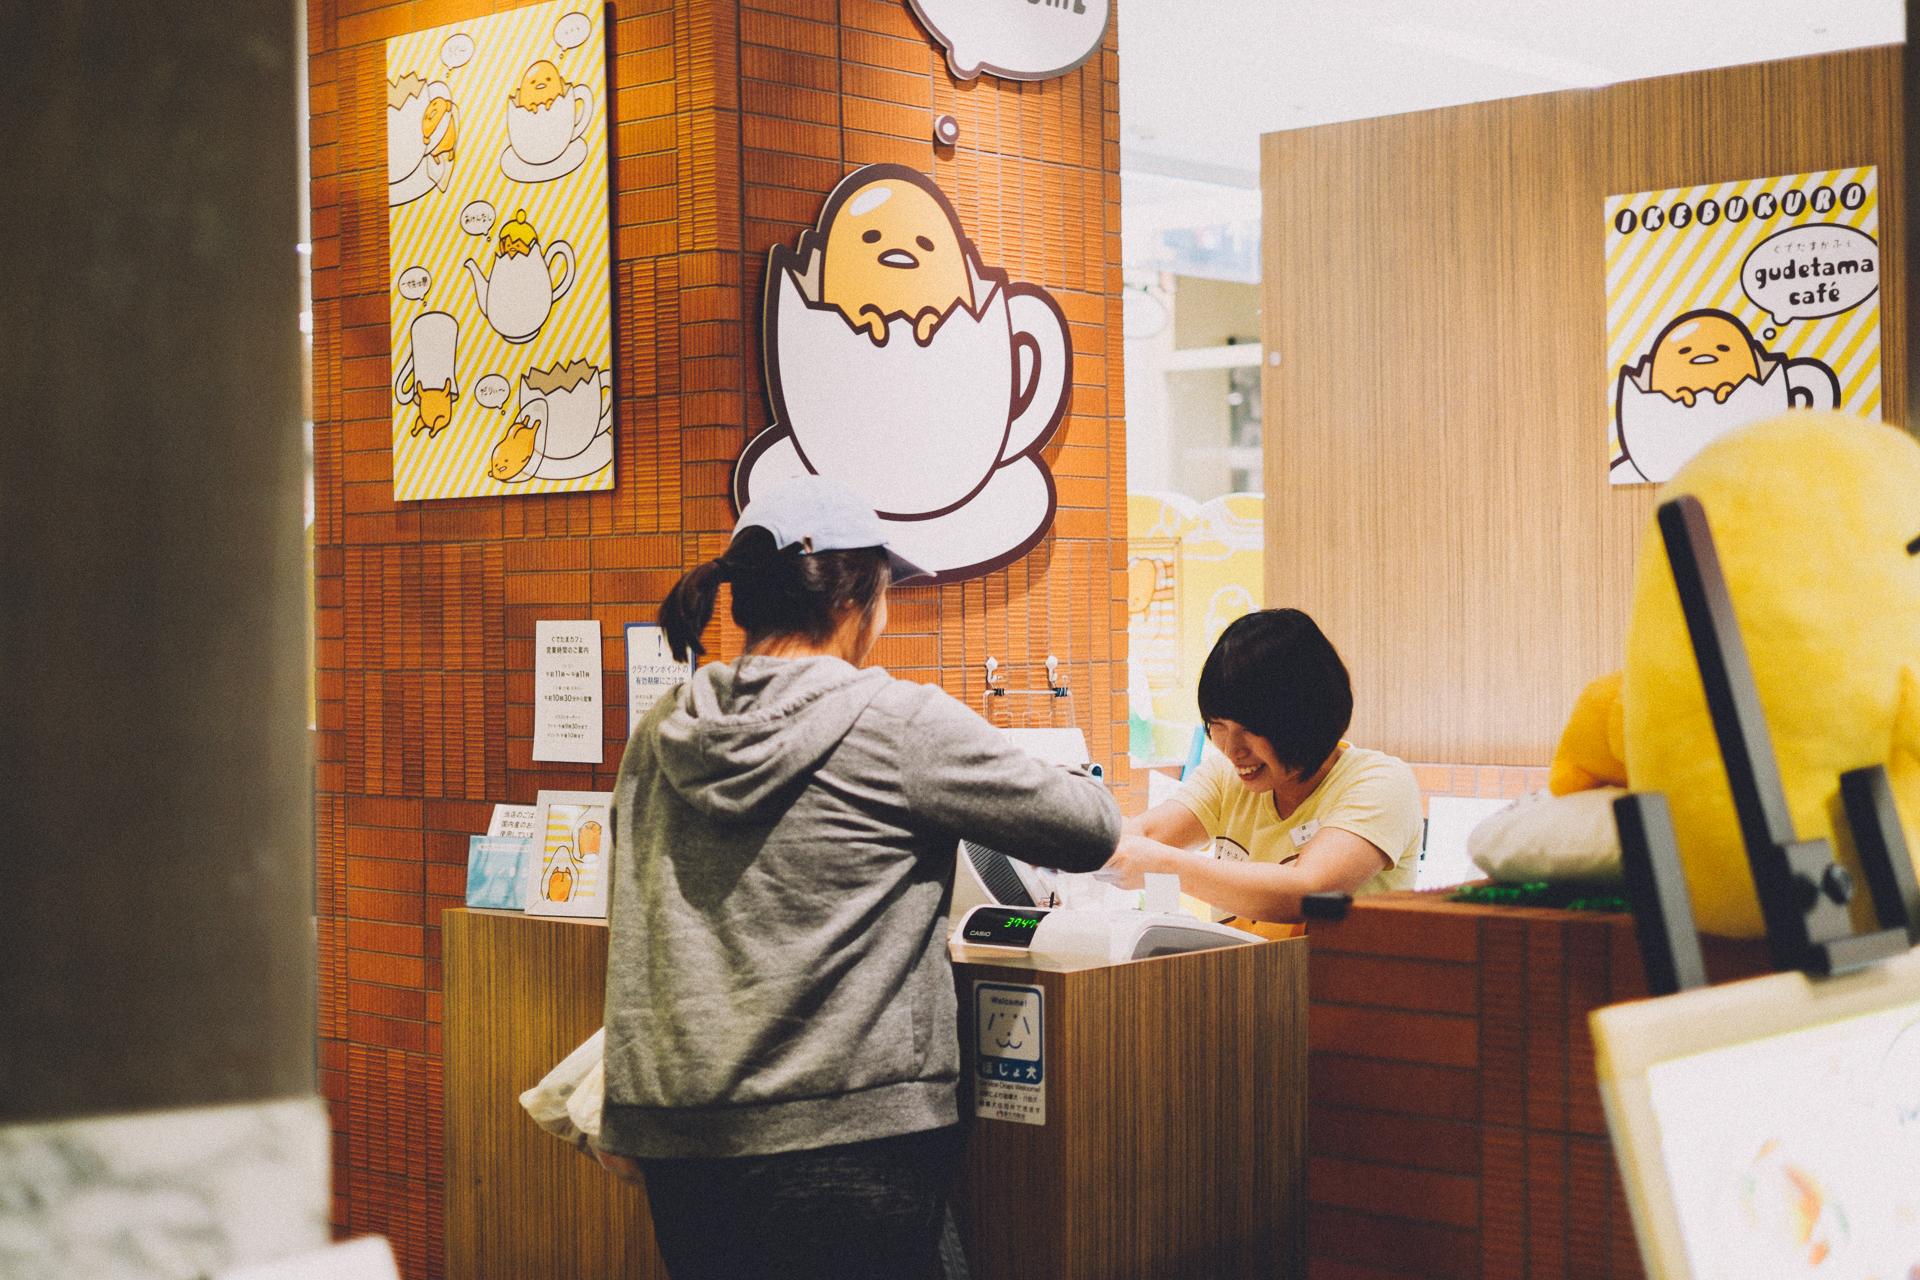 gudetama-cafe-tokyo-36.jpg